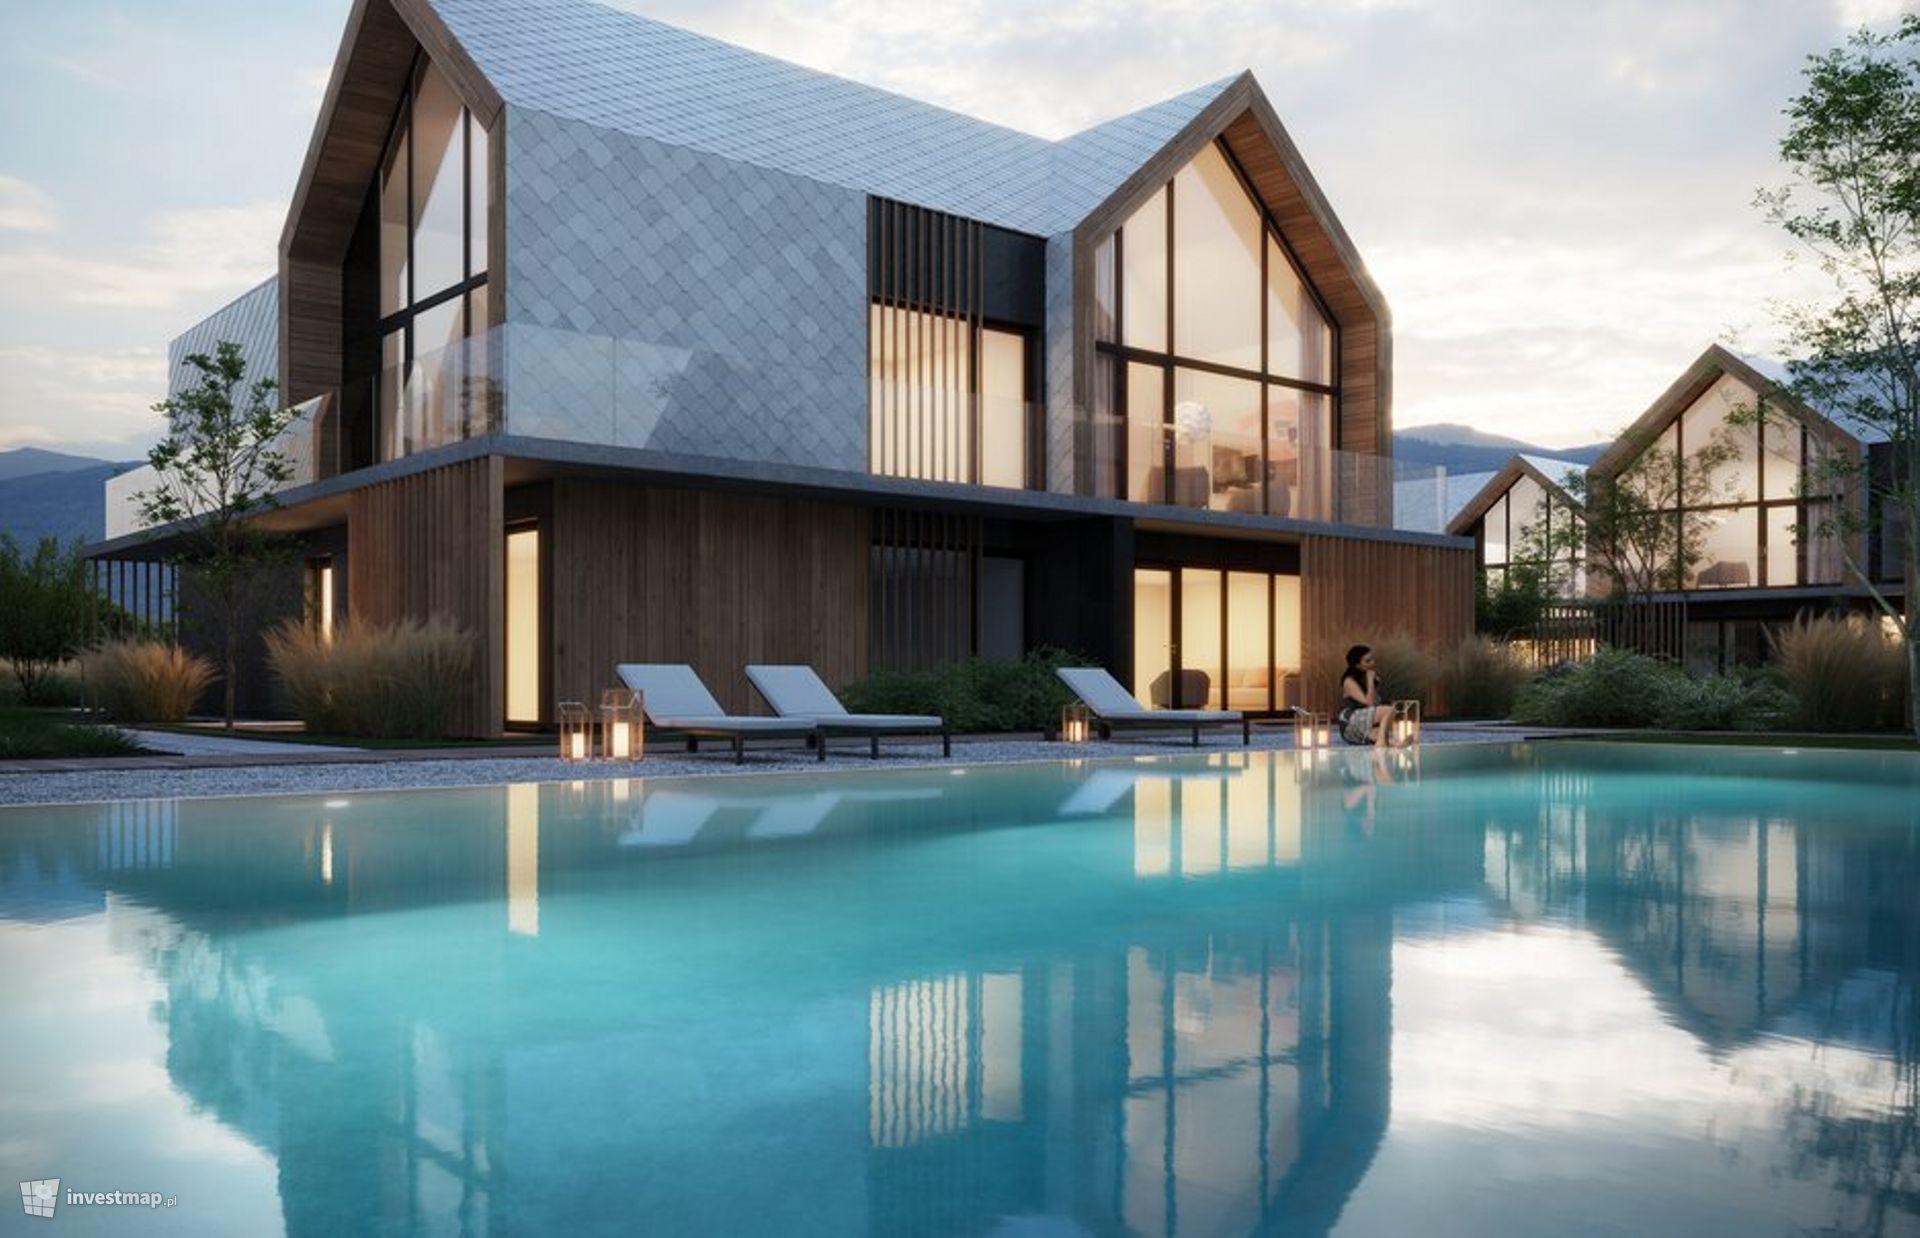 Karkonosze Springs Hotels&Resorts